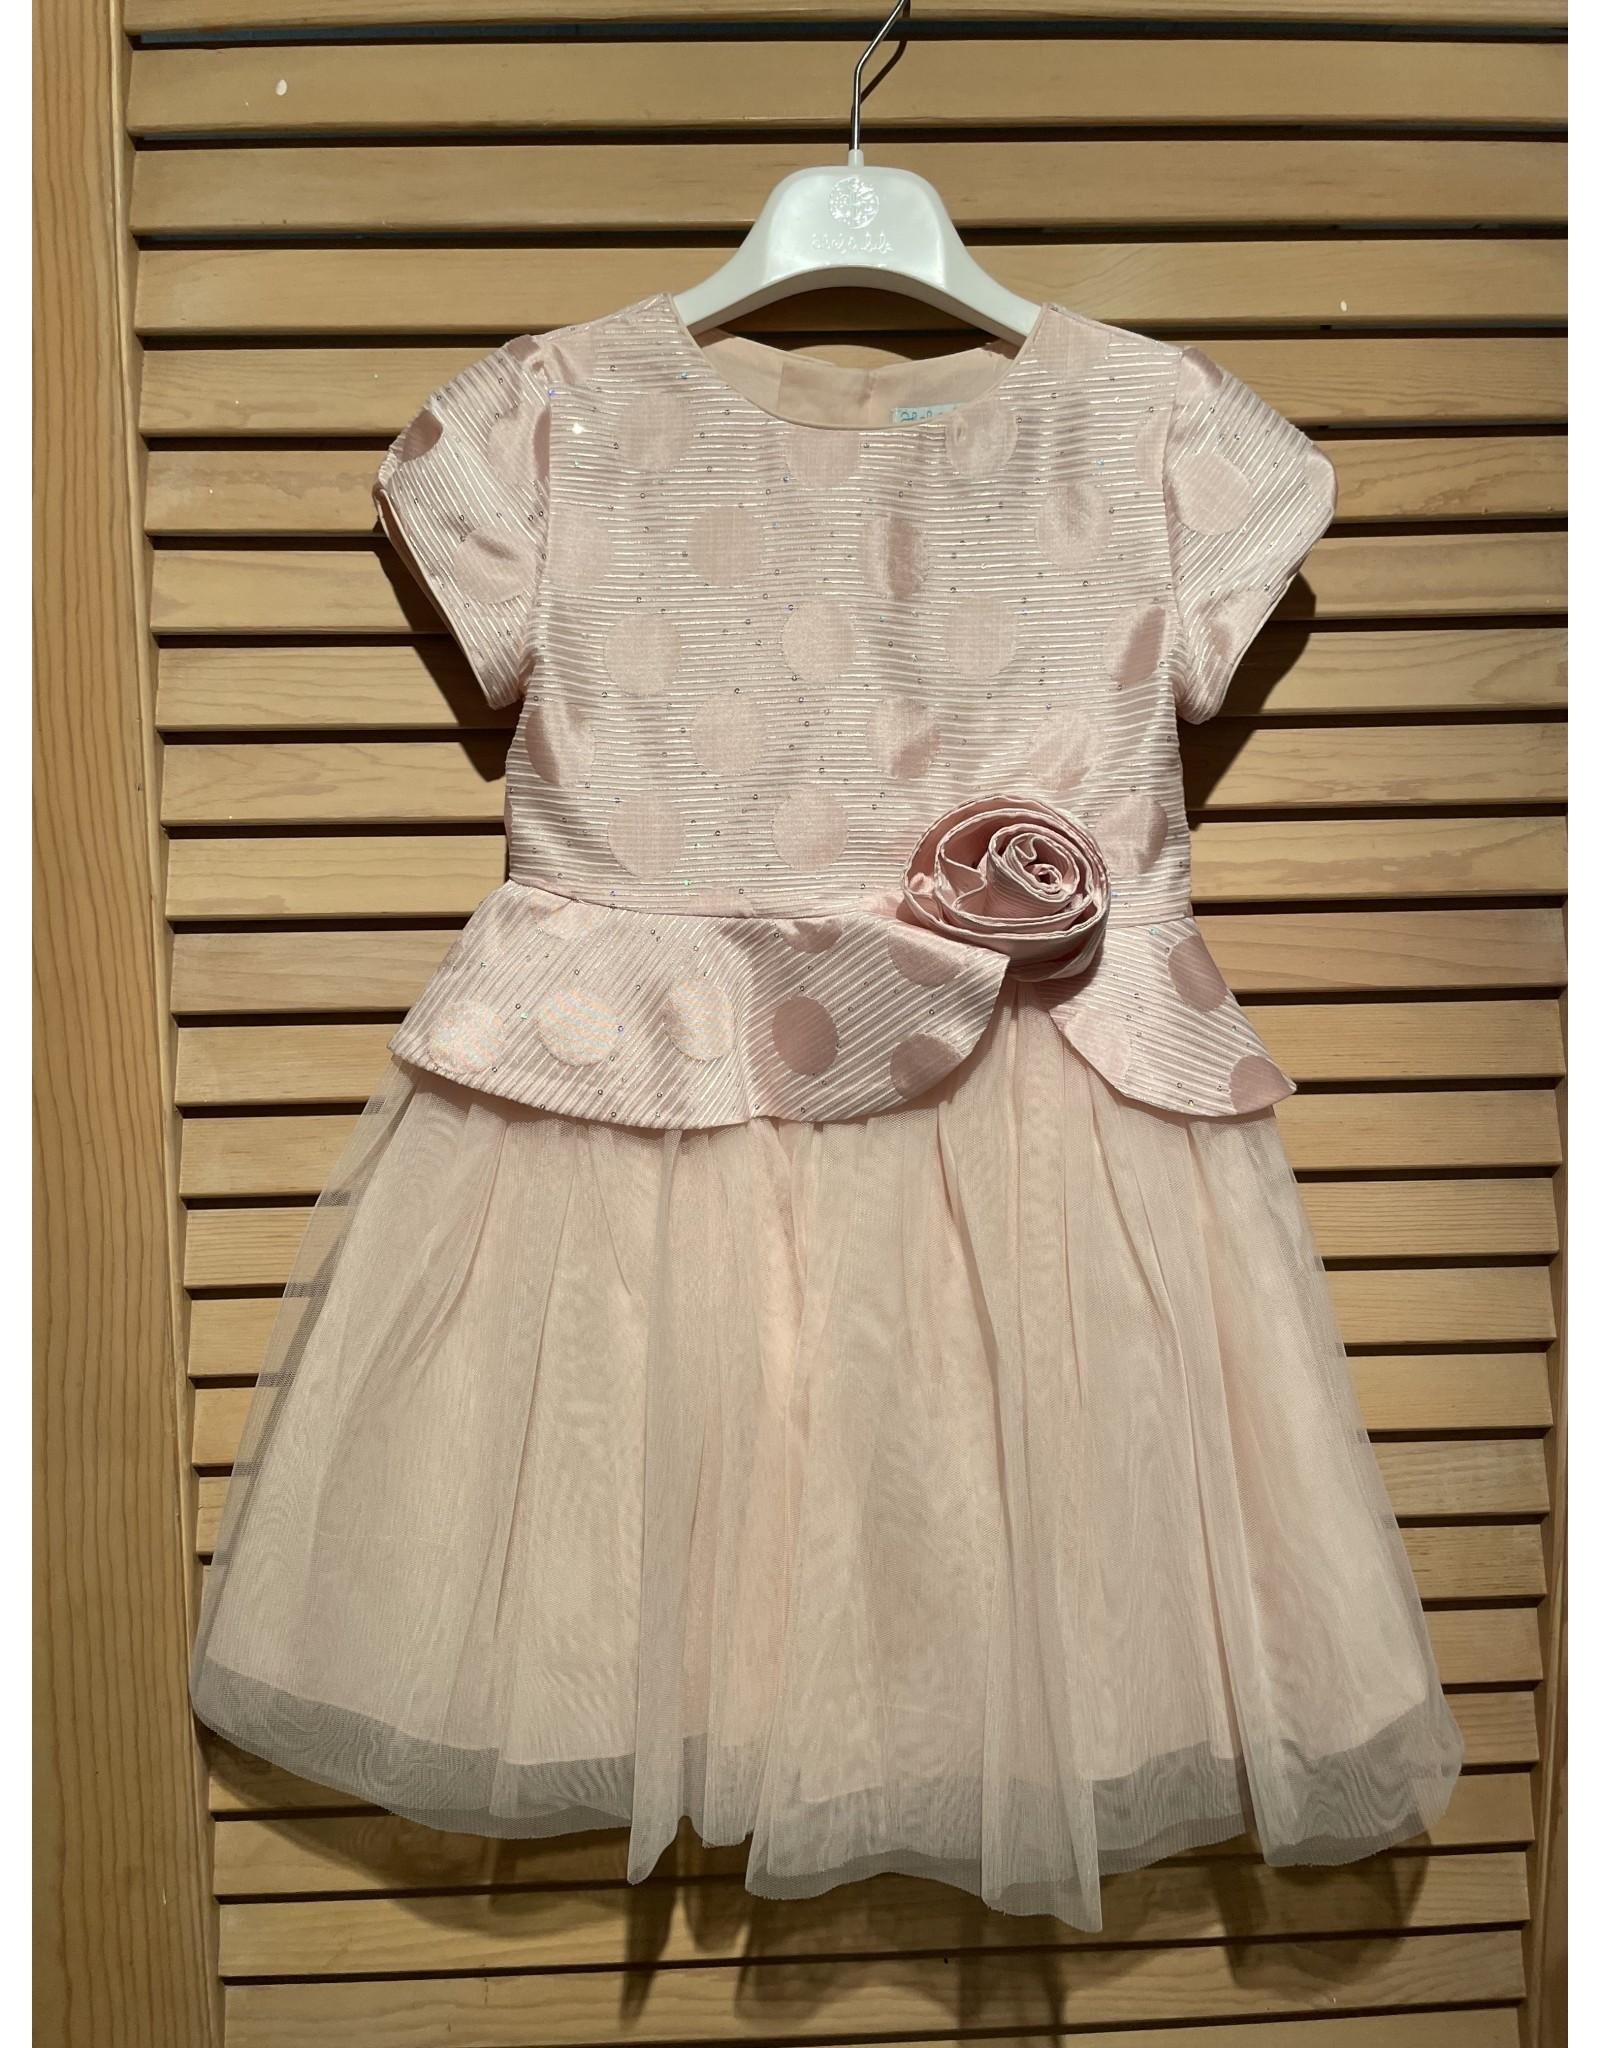 Abel & Lula Rose Polka Dot Dress with Tule Skirt